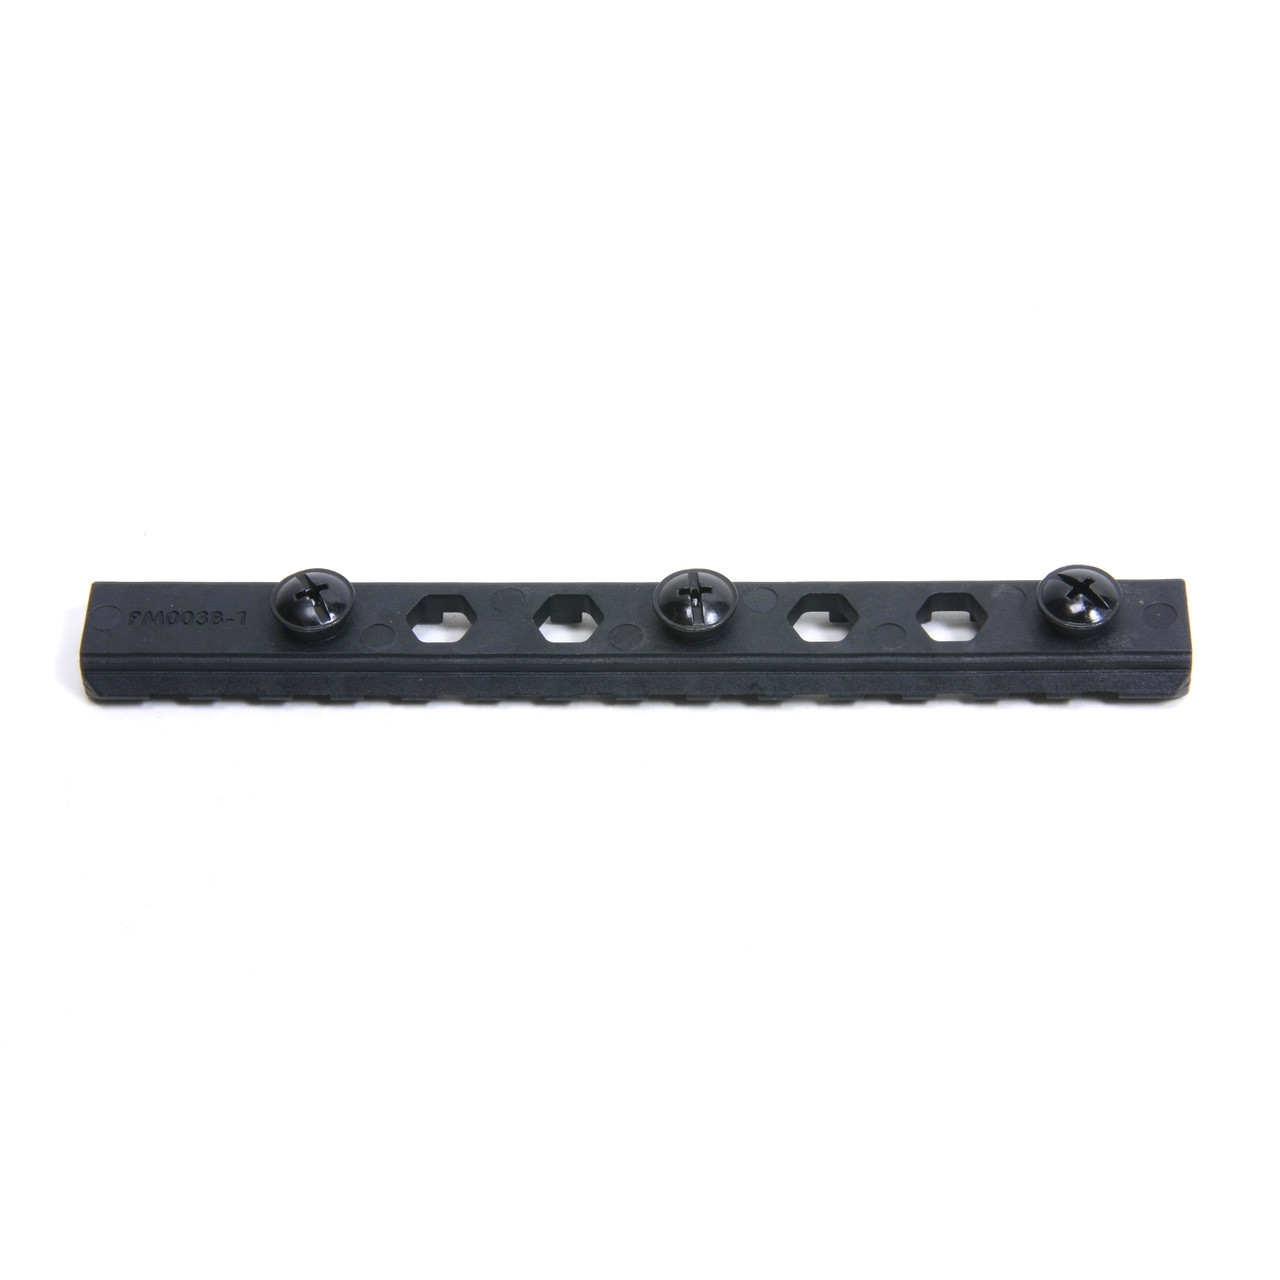 AR-15® / M16 Rifle Hand Guard Rail - Black Polymer